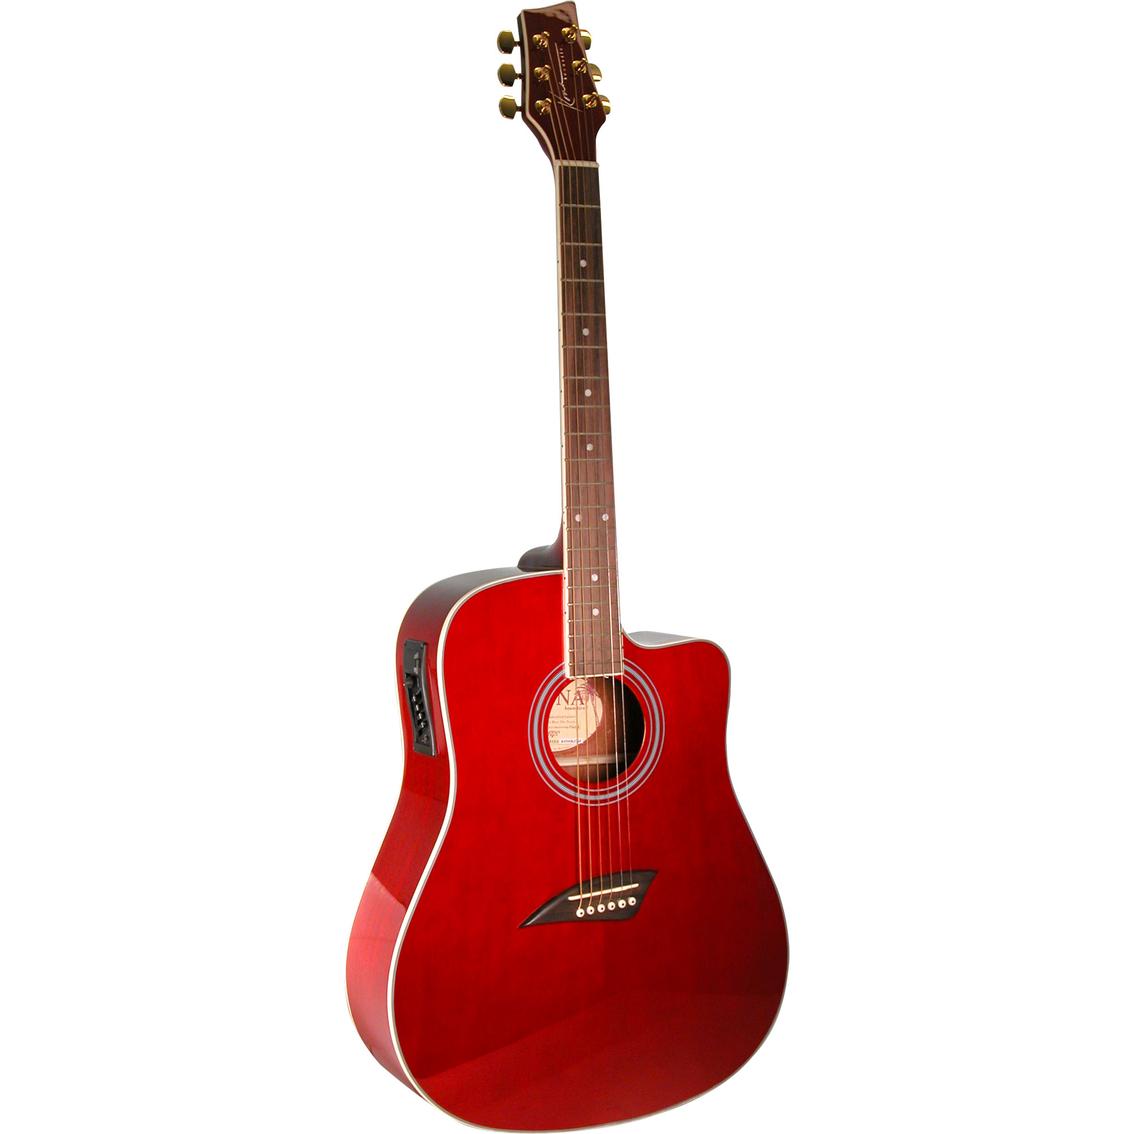 kona acoustic electric guitar guitars electronics shop the exchange. Black Bedroom Furniture Sets. Home Design Ideas